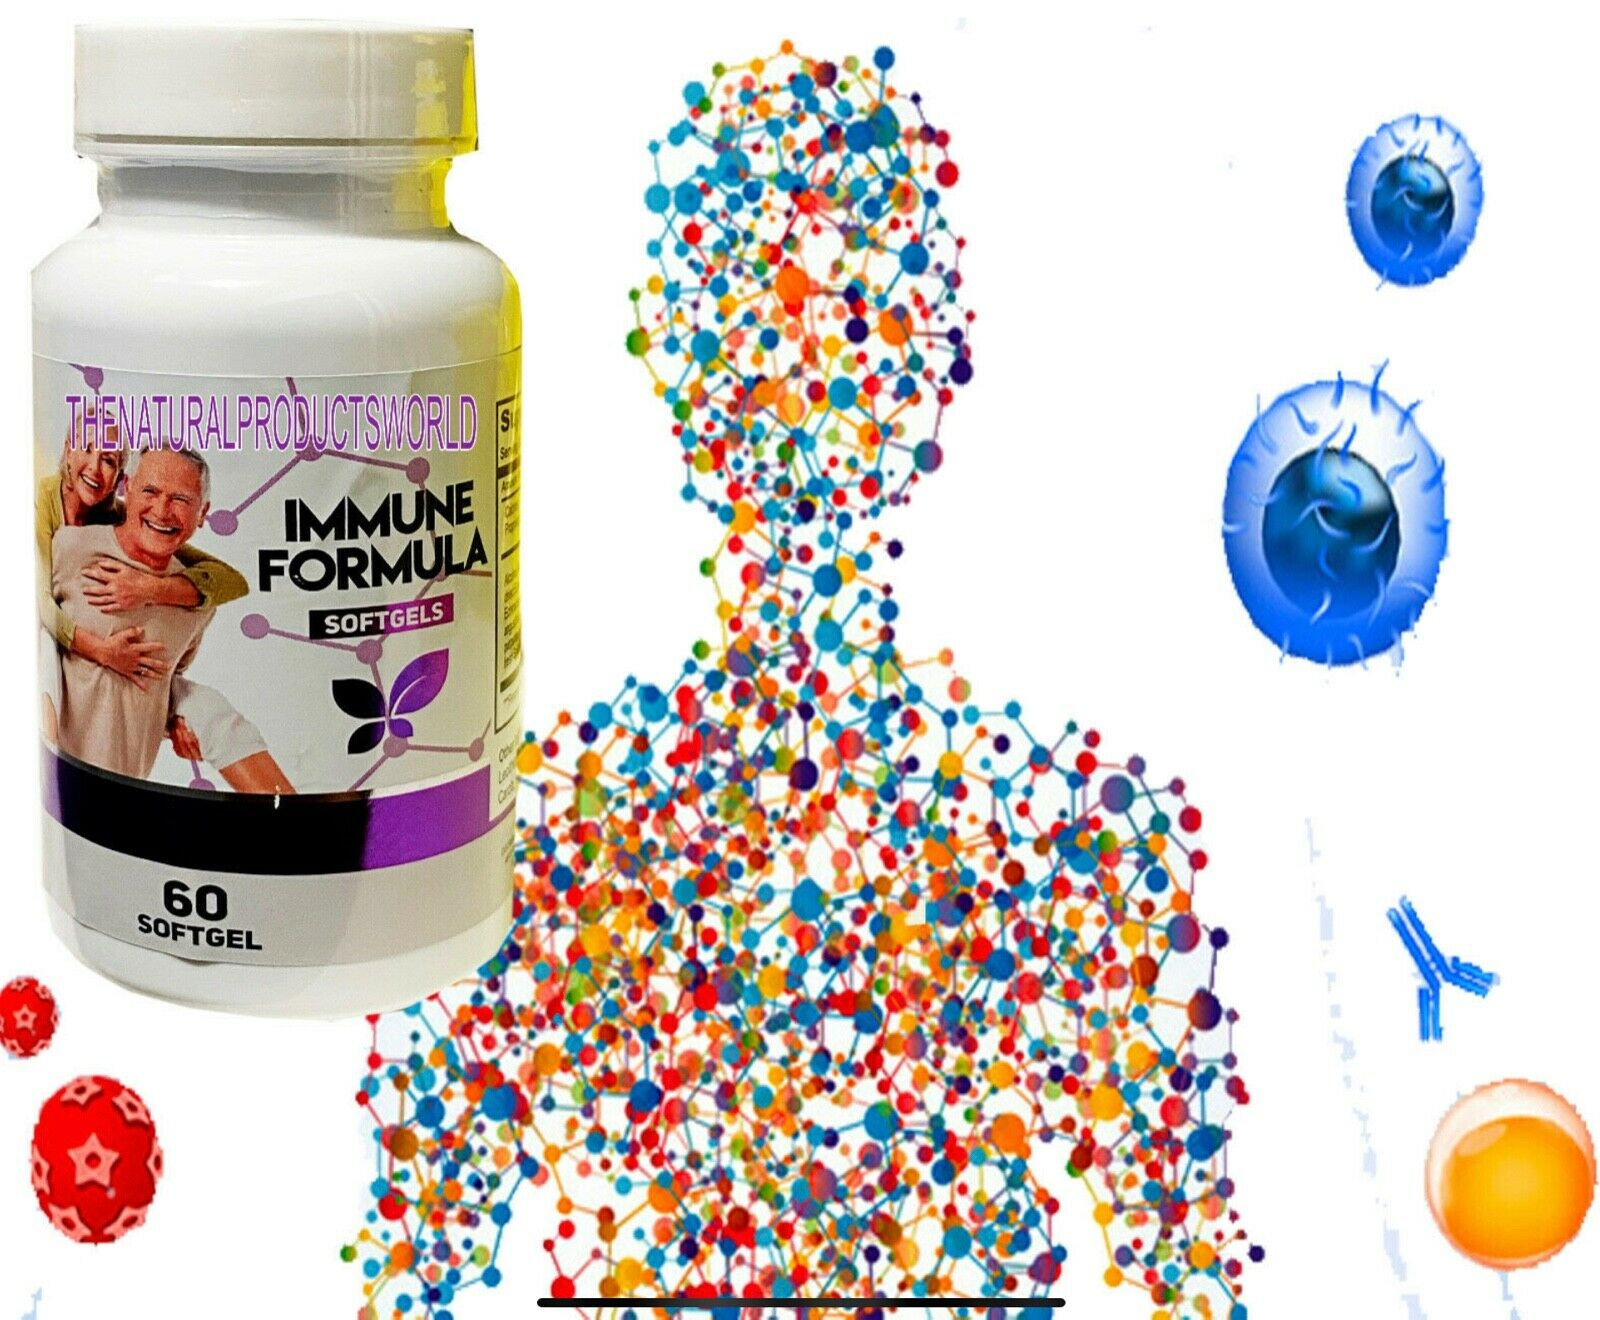 Pure Inmune Support Immune System, Antioxidant, Booster, Virus Shield,Inmunovid